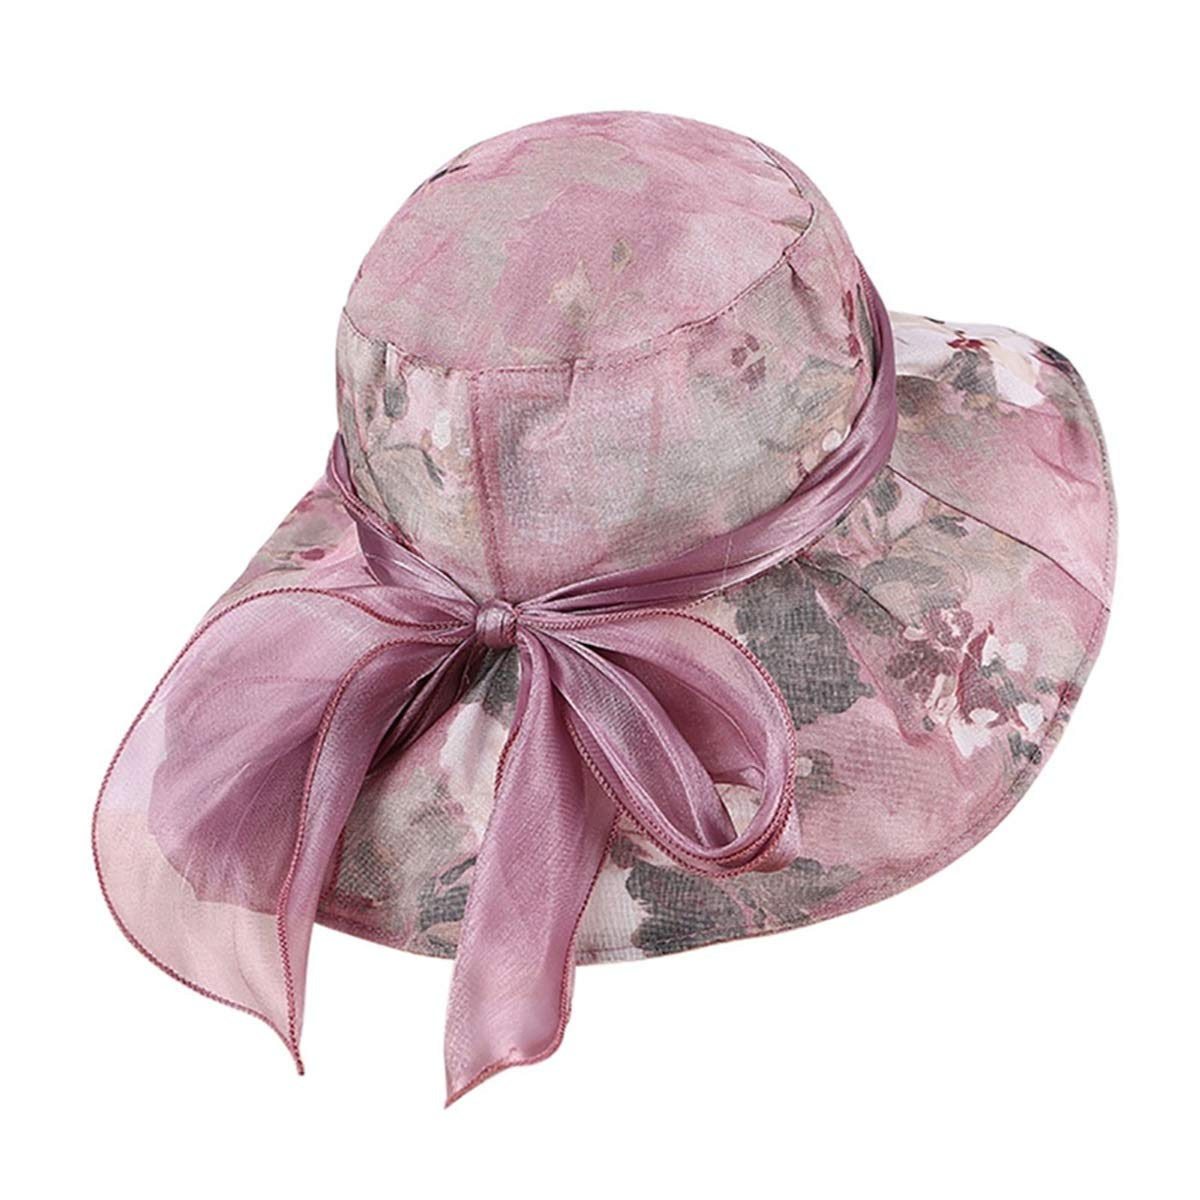 KSDJSA Women Cotton Sun Hat Wide Brim Edge Sunproof Anti-UV Foldable Beach Hat L